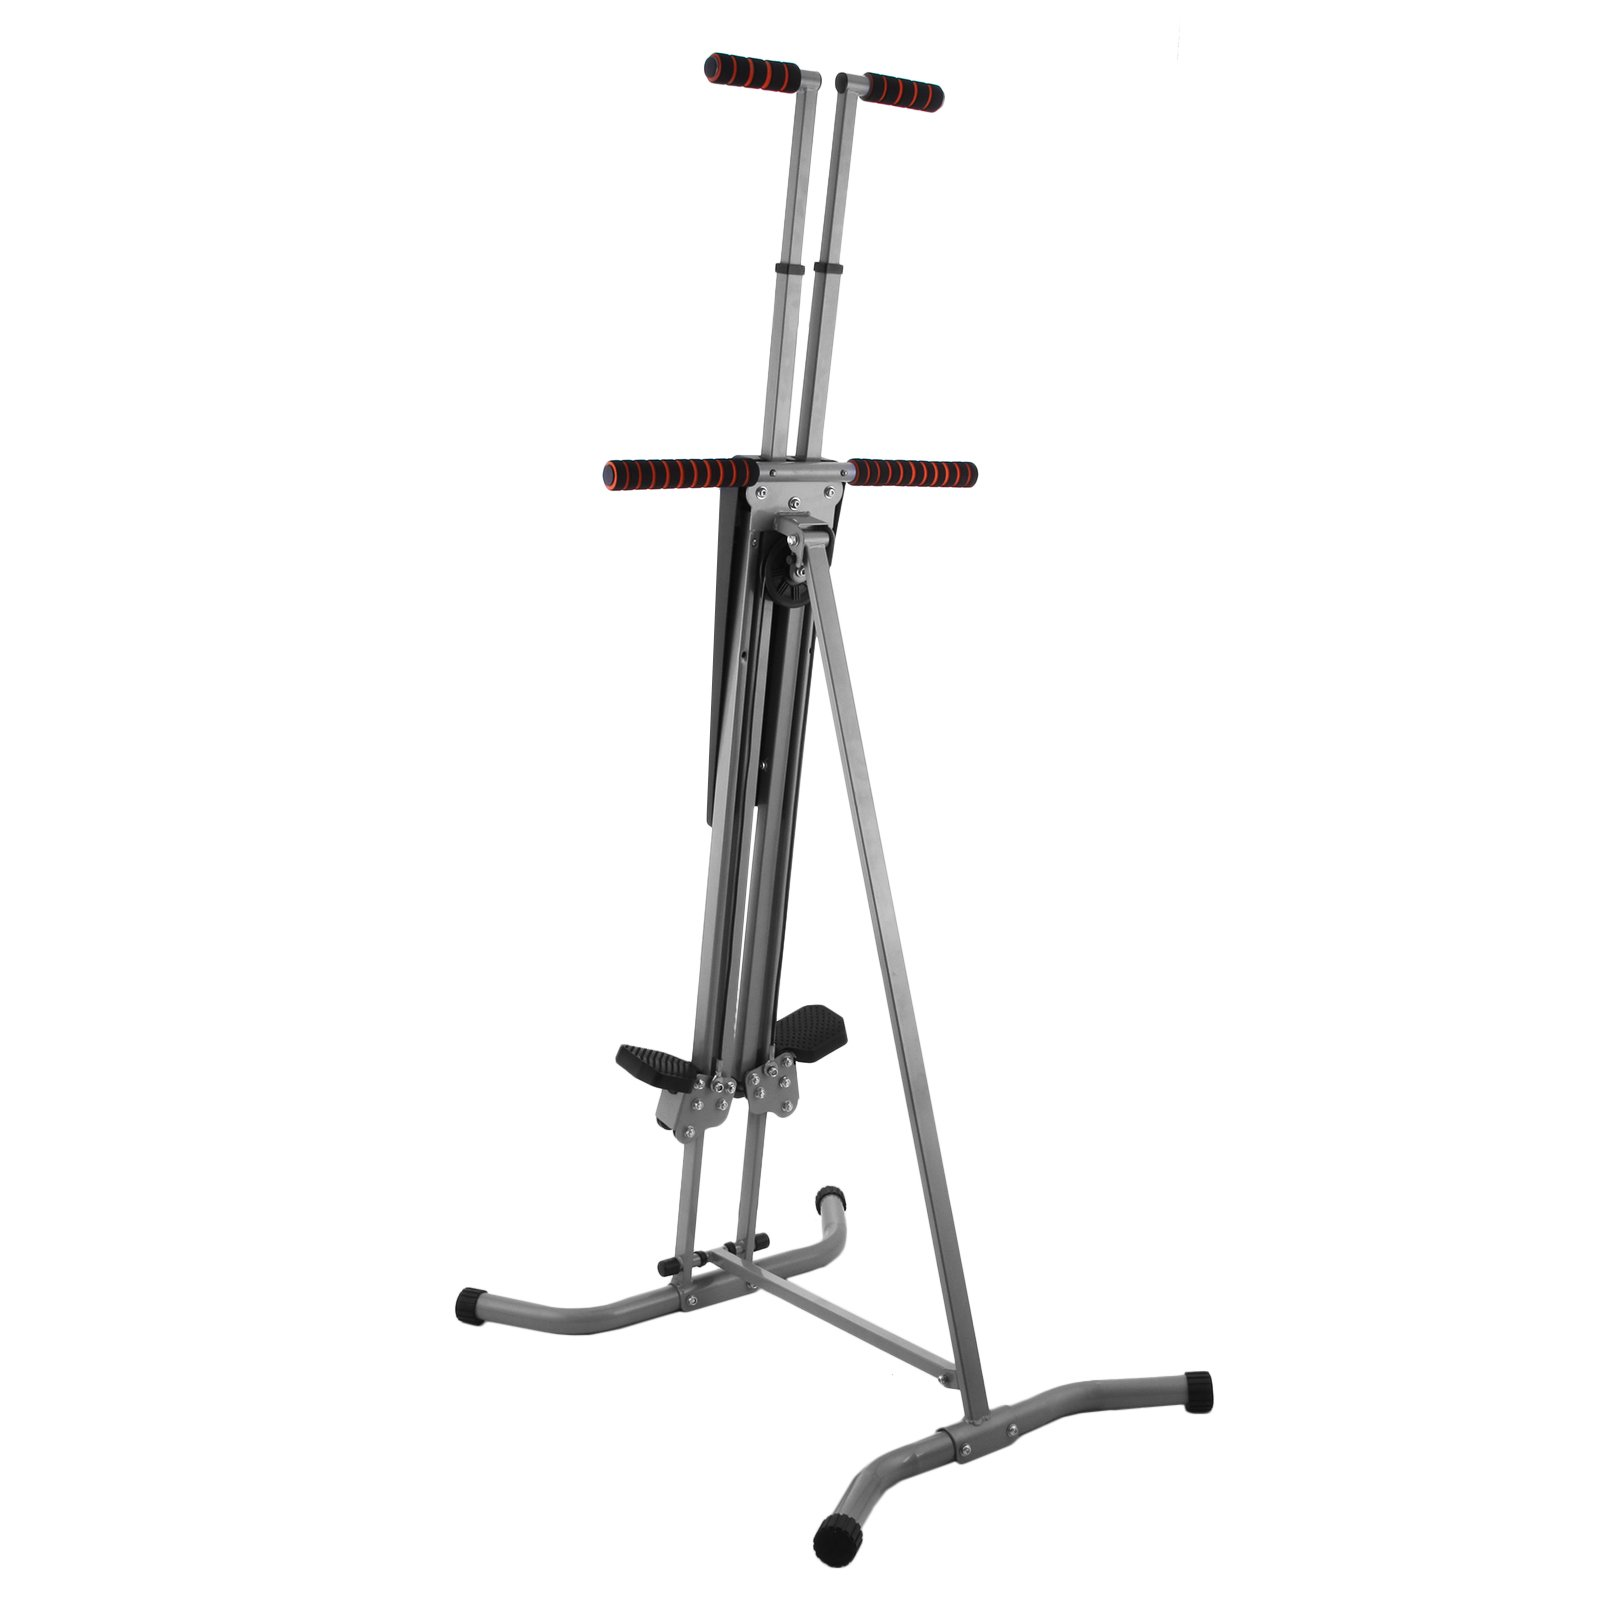 Popsport 440LBS Climber Machine Fitness Stepper Climber Exercise Equipment Vertical Climber for Home Gym Exercise Stepper Cardio Climbing System (P8006,Gray) by Popsport (Image #3)